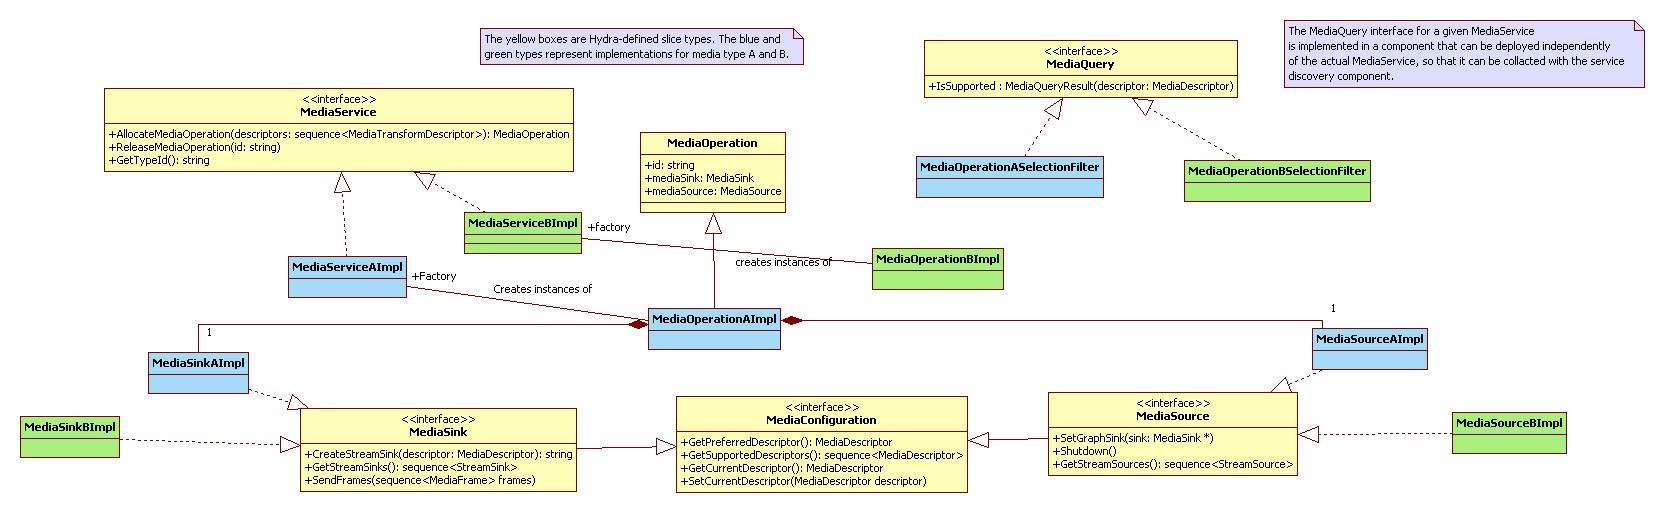 Diagrams sequence diagram wikipedia collaboration hyundai stereo diagrams sequence diagram wikipedia collaboration diagrams sequence diagram wikipedia collaboration ccuart Gallery